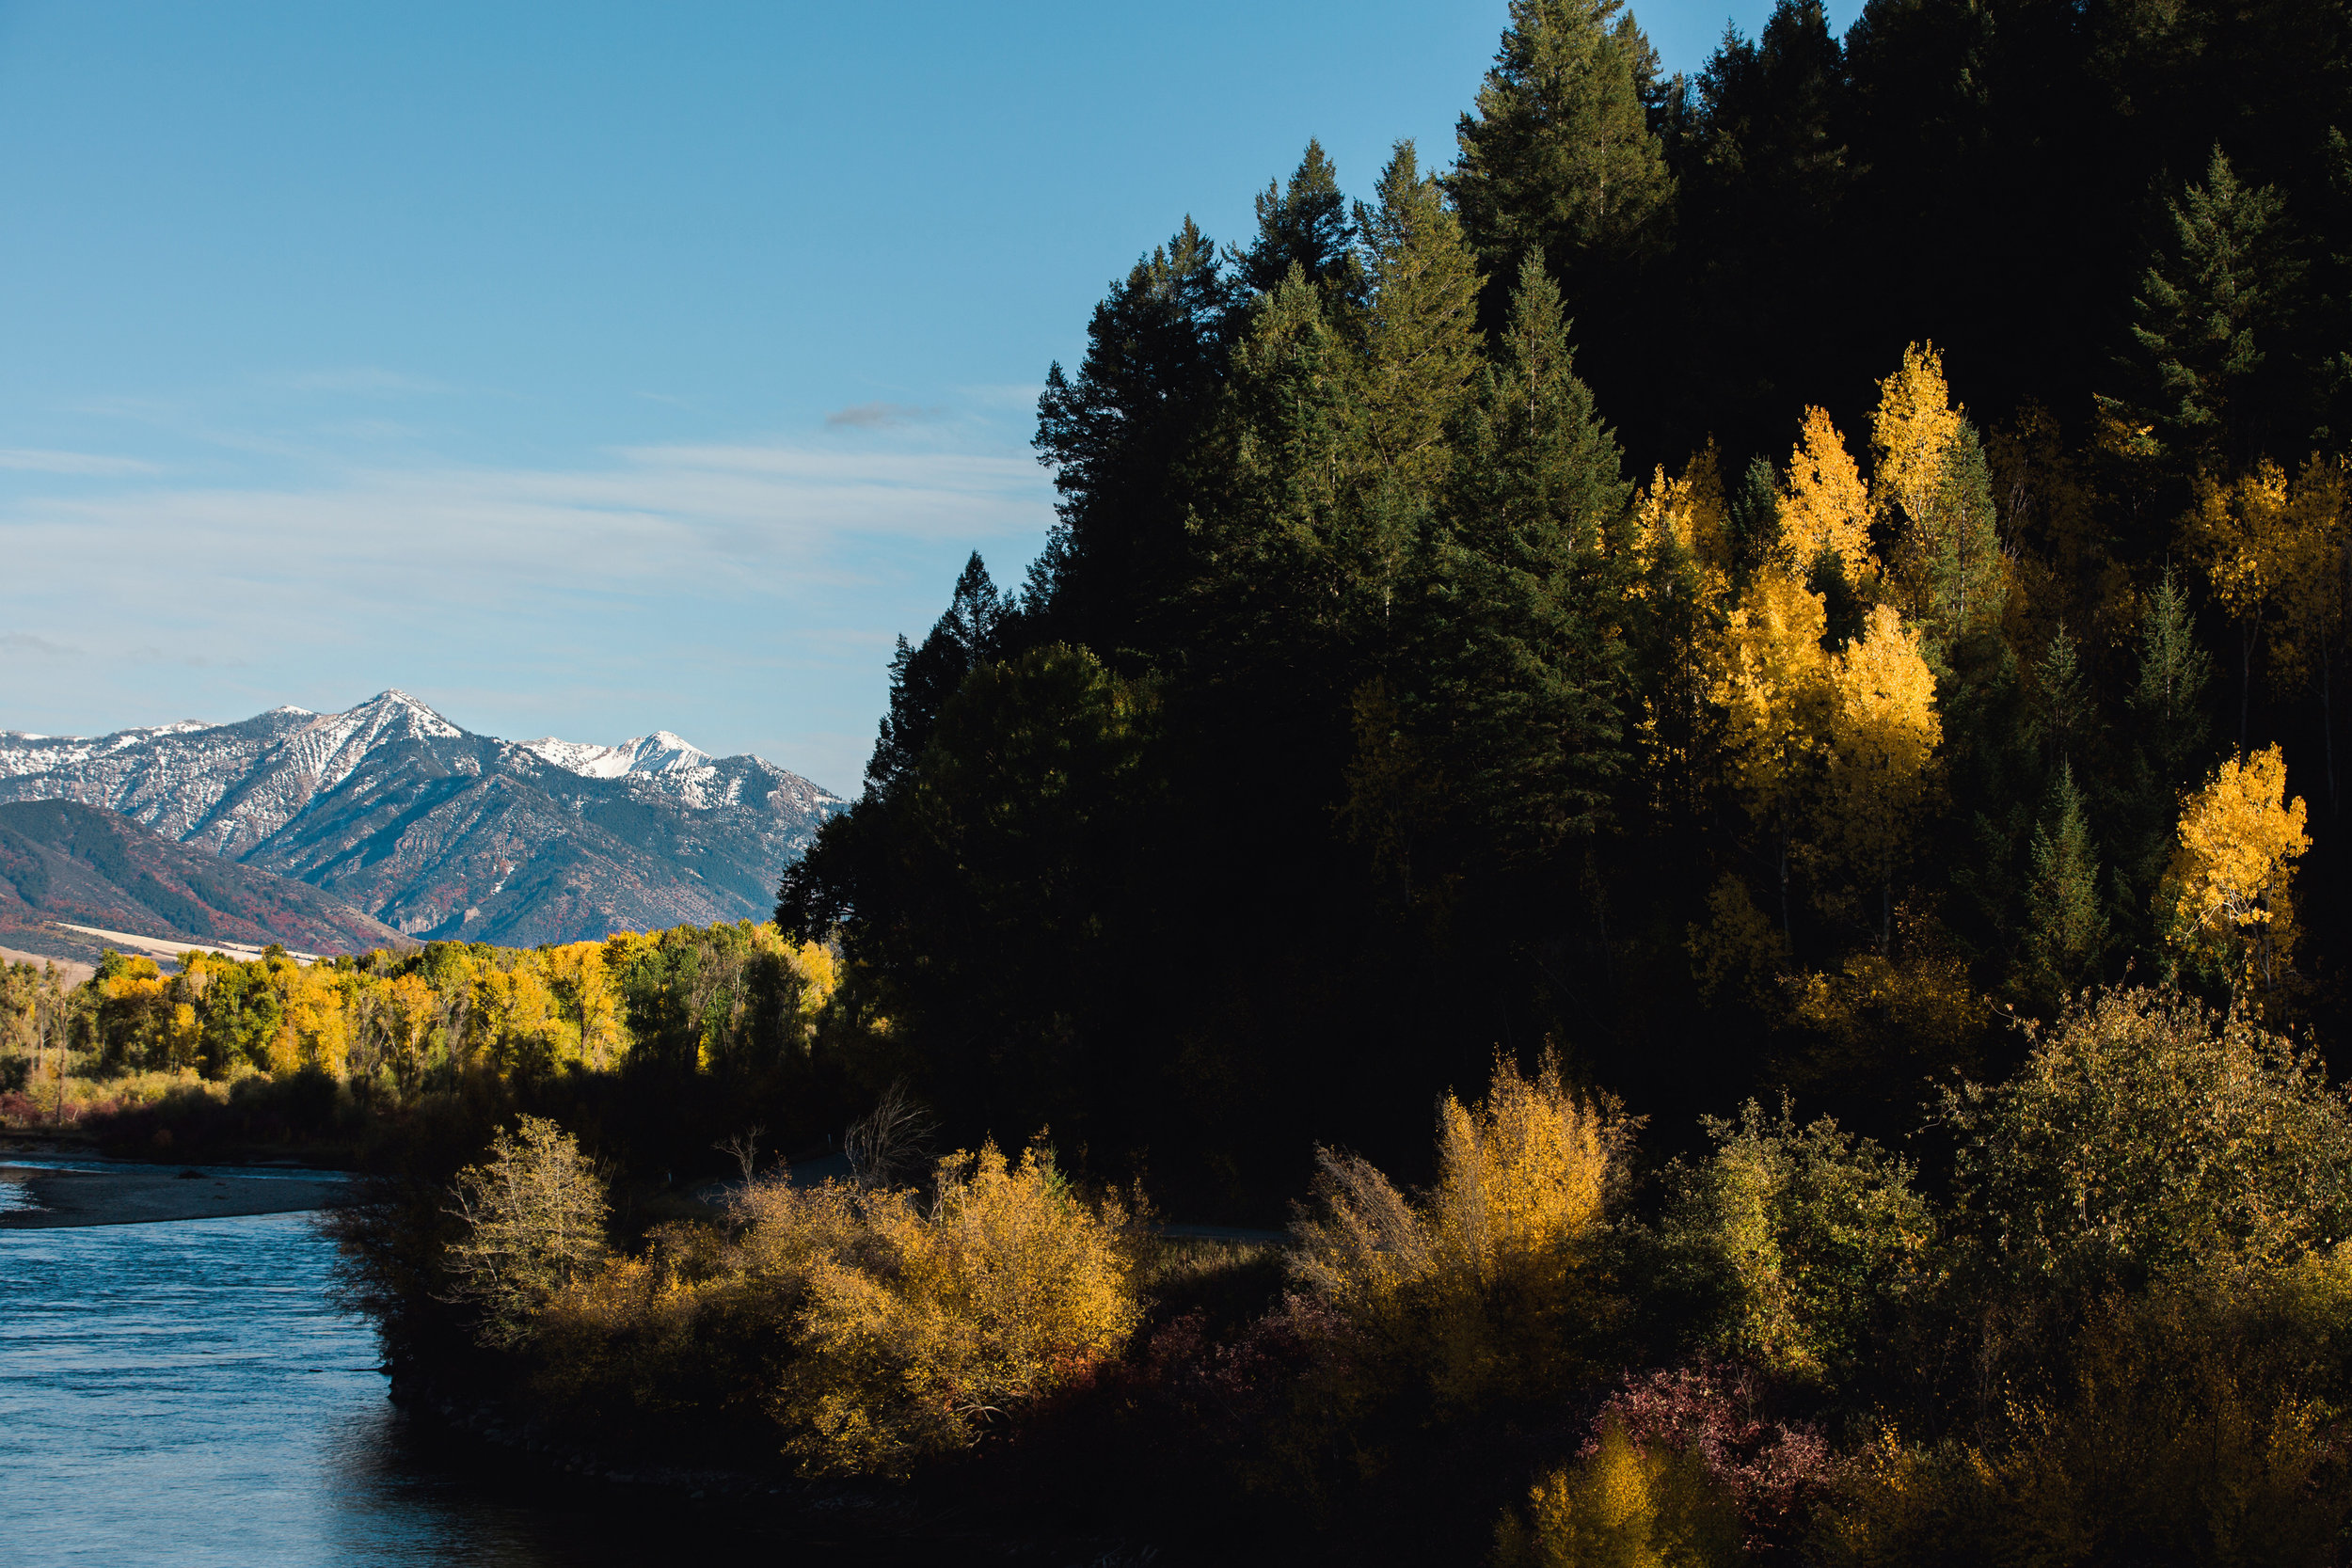 Cindy_Giovagnoli_Idaho_Wyoming_Grand_Teton_National_Park_autumn_aspens_camping_mountains-005.jpg